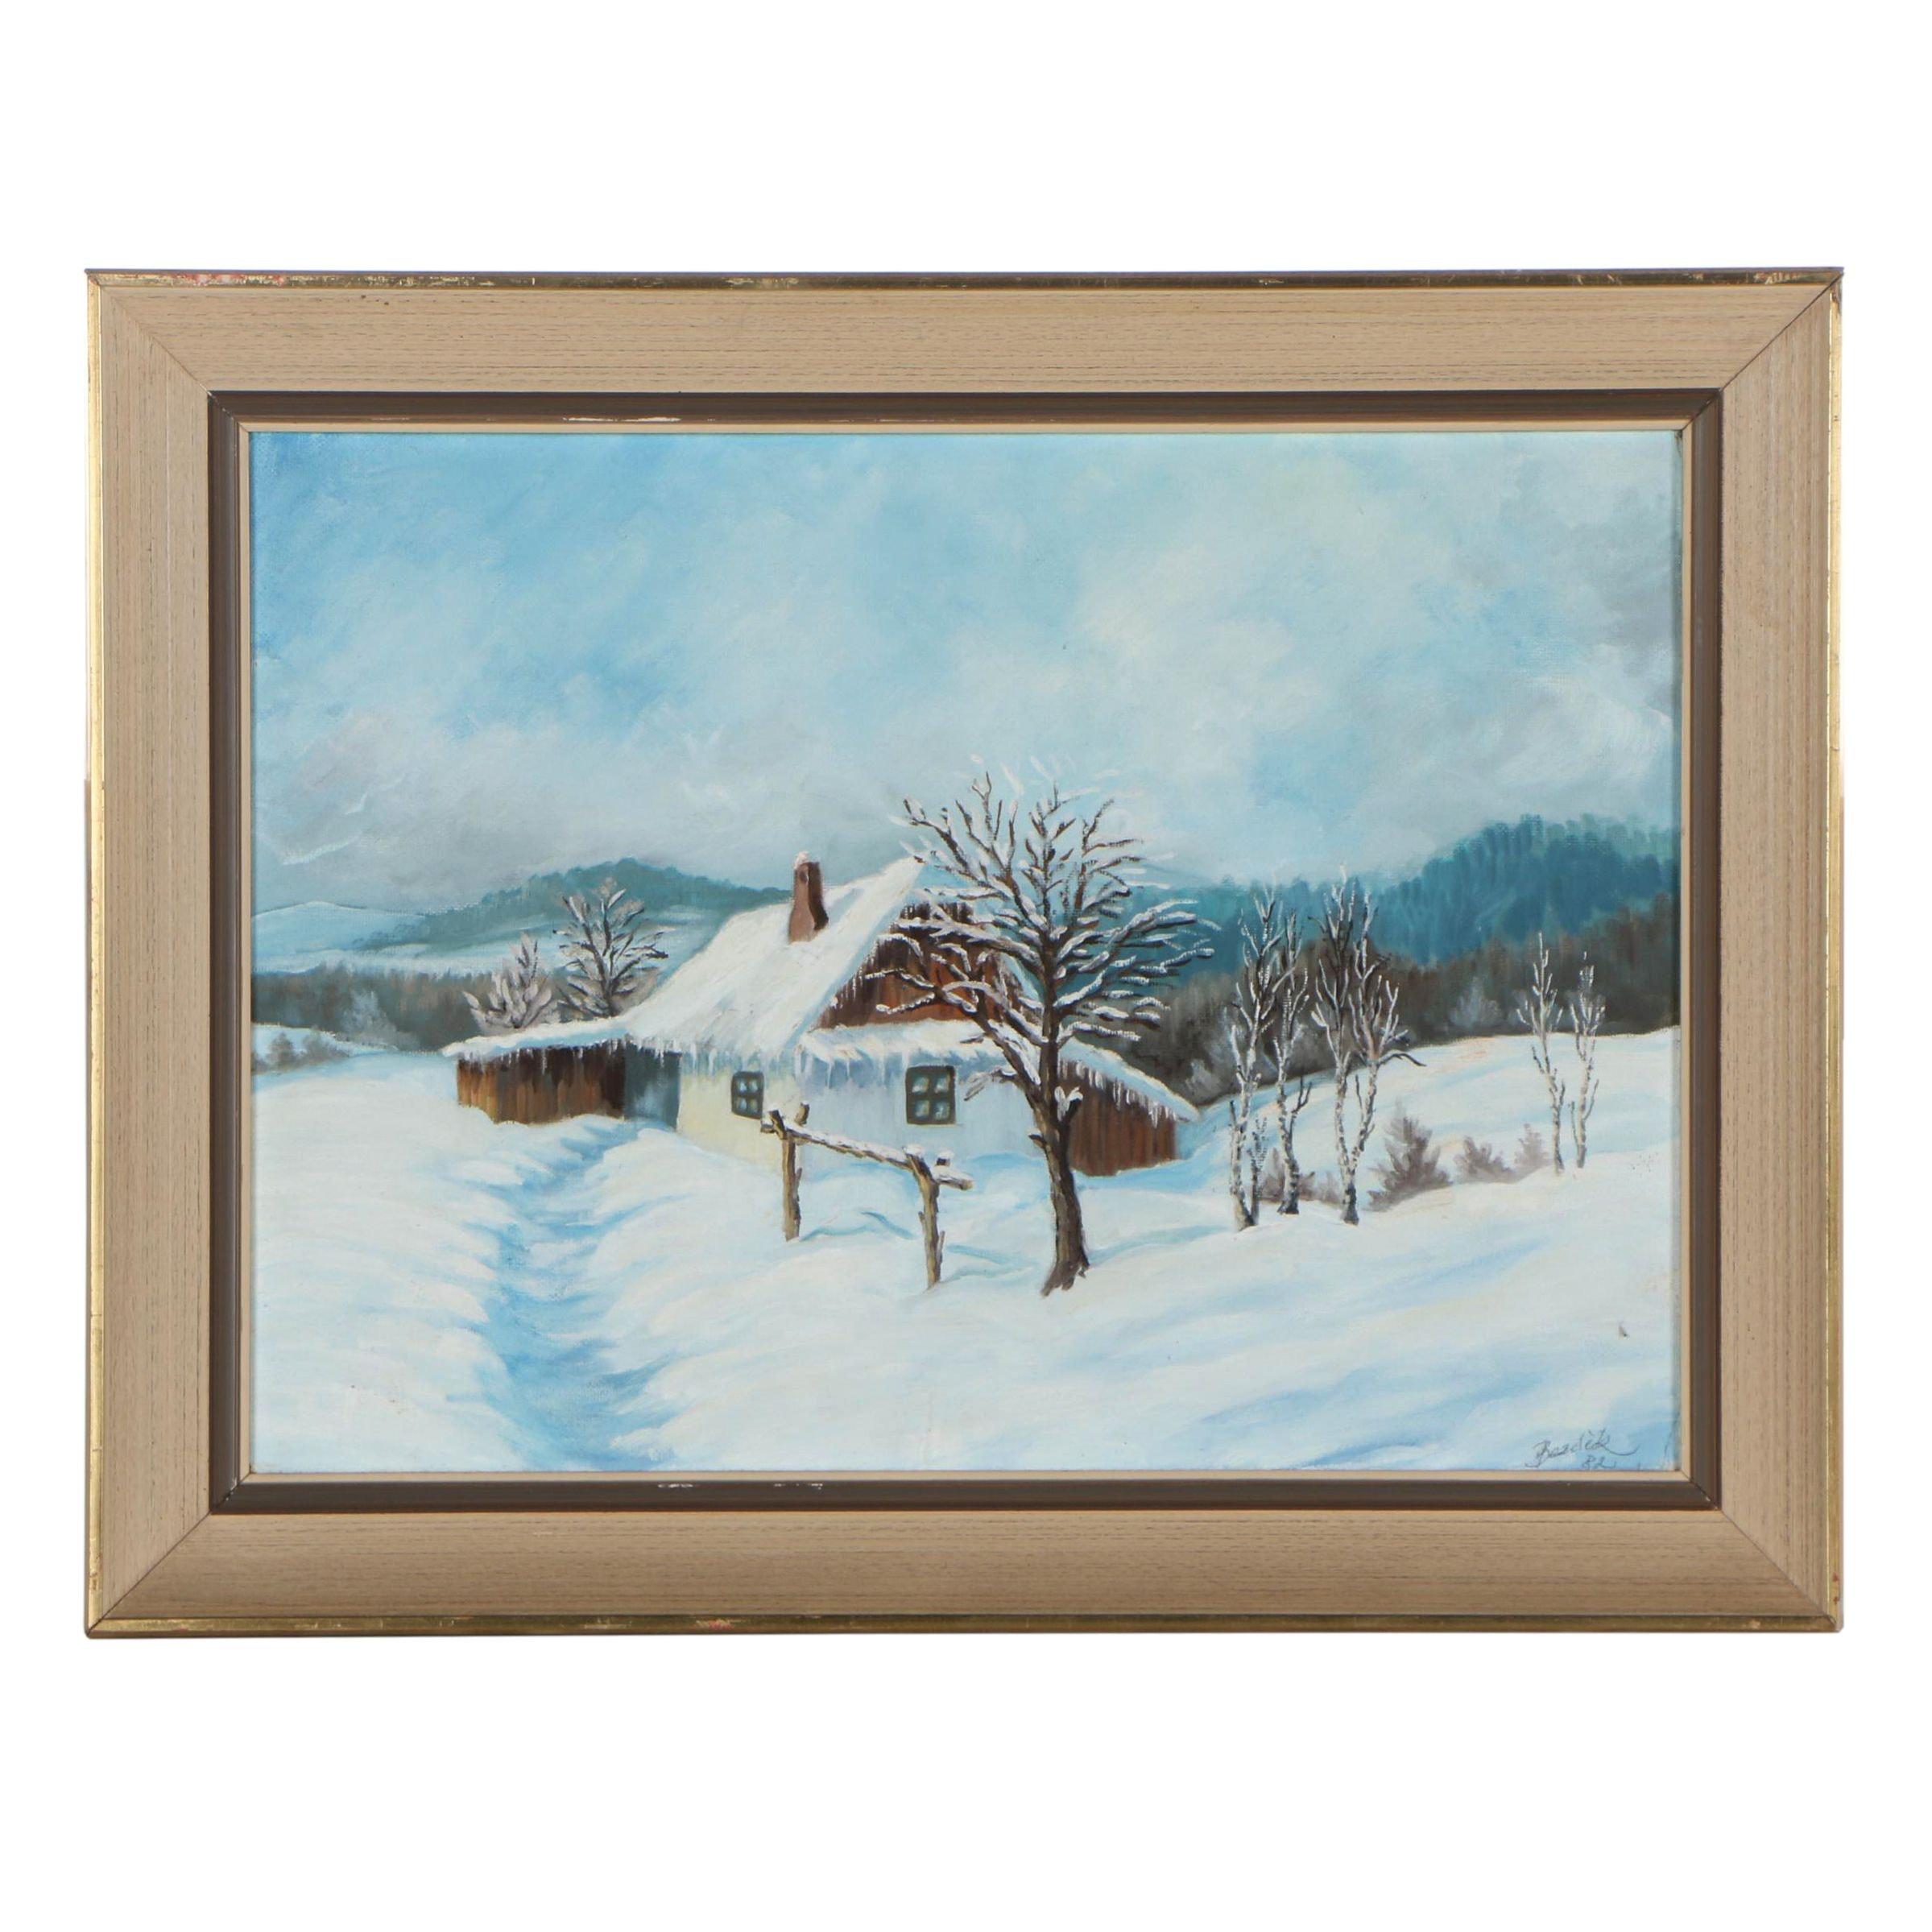 František Bezděk 1982 Winter Landscape Oil Painting